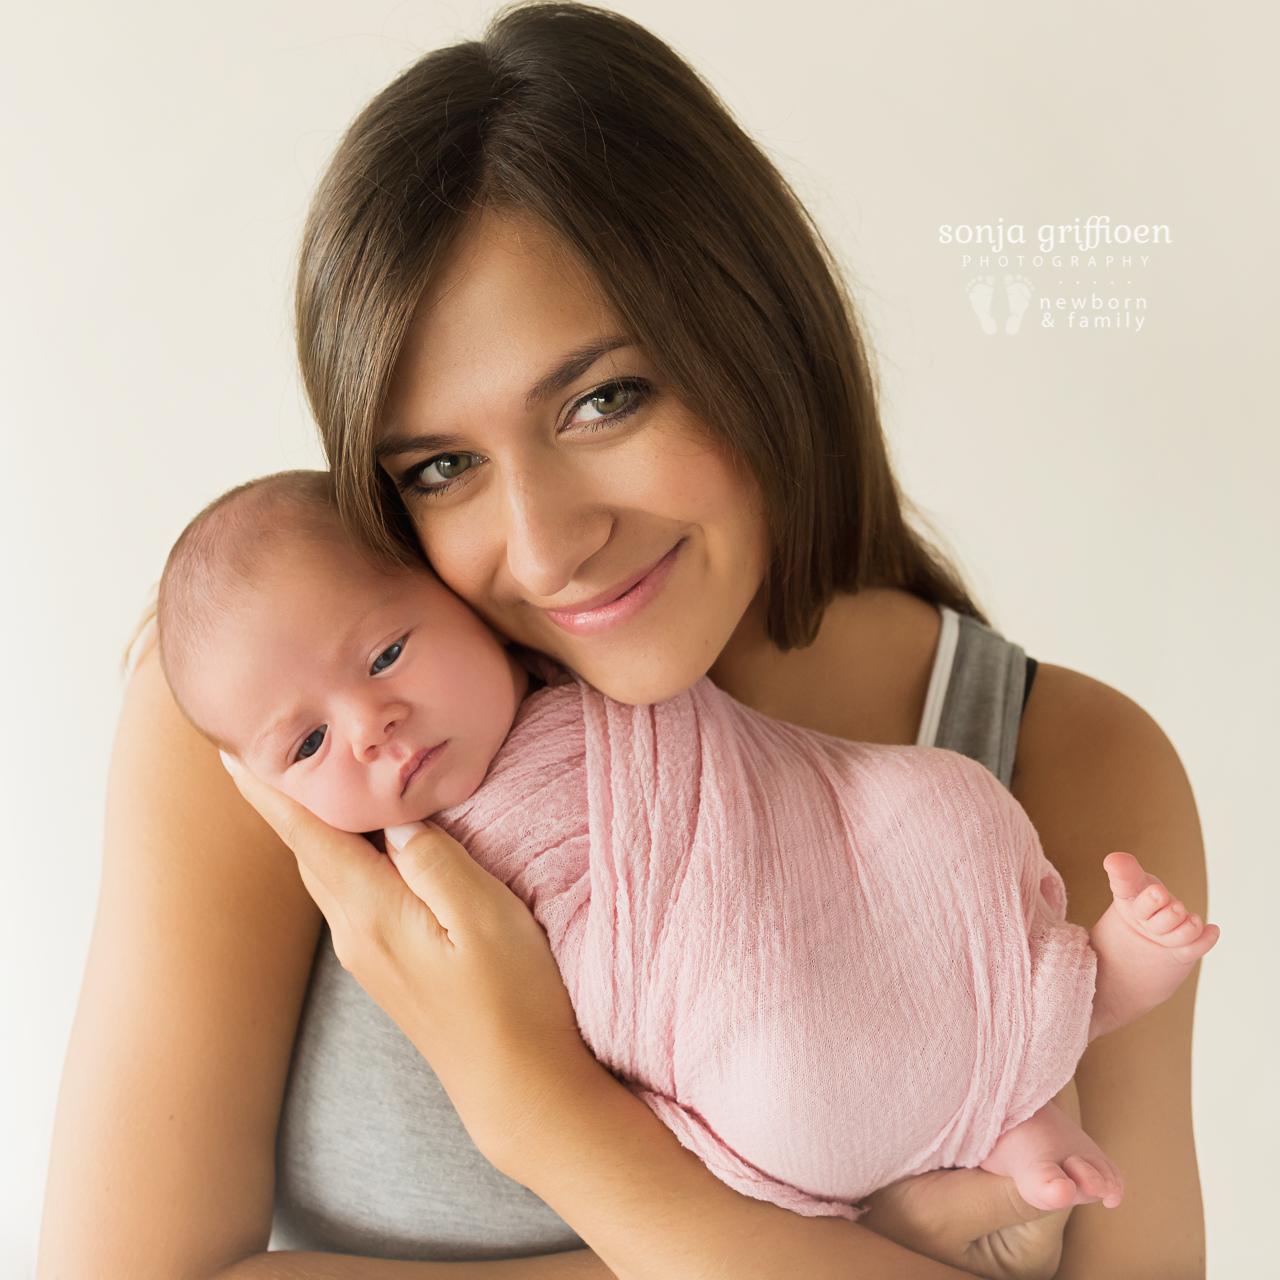 Thalia-Newborn-Brisbane-Newborn-Photographer-Sonja-Griffioen-30.jpg